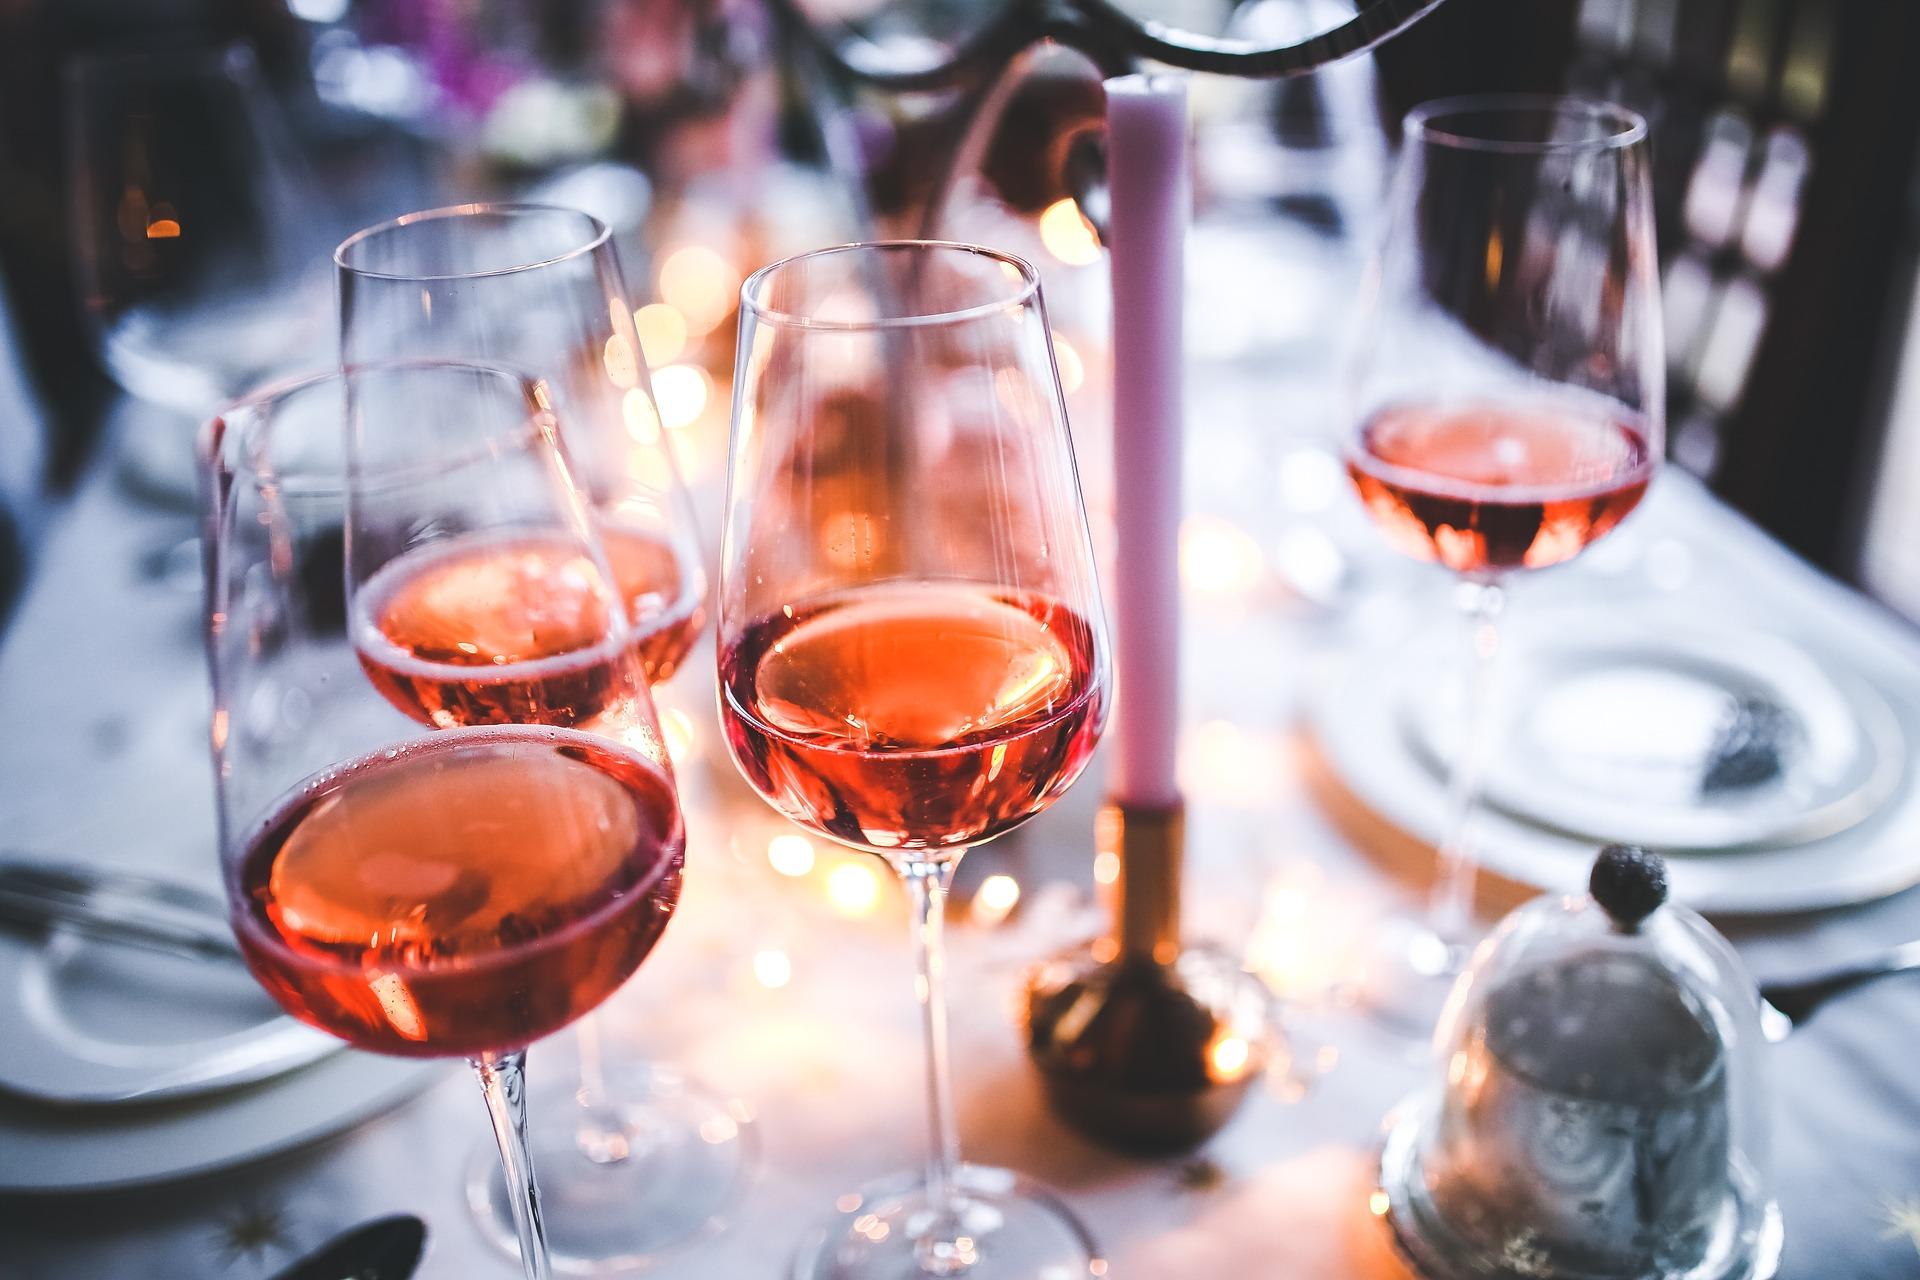 wine-791133_1920.jpg